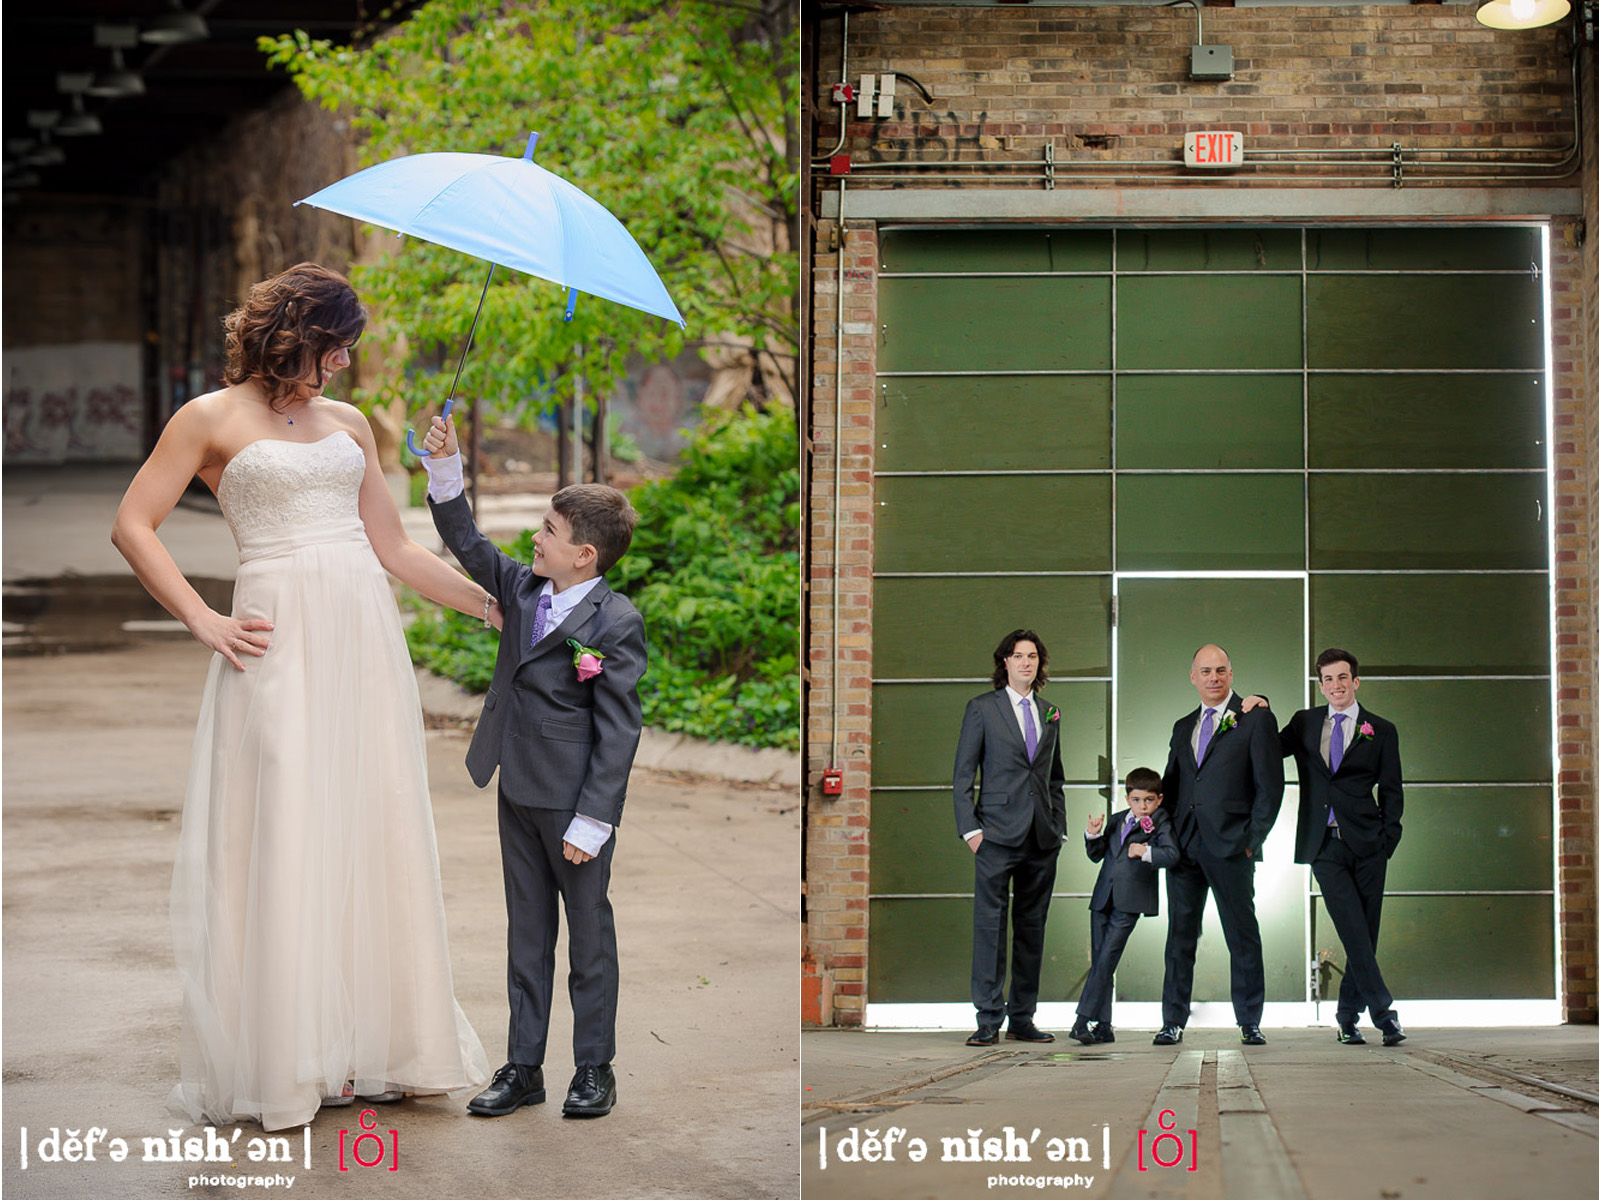 Definition Photography Weddings Globe Danforth-1004.jpg